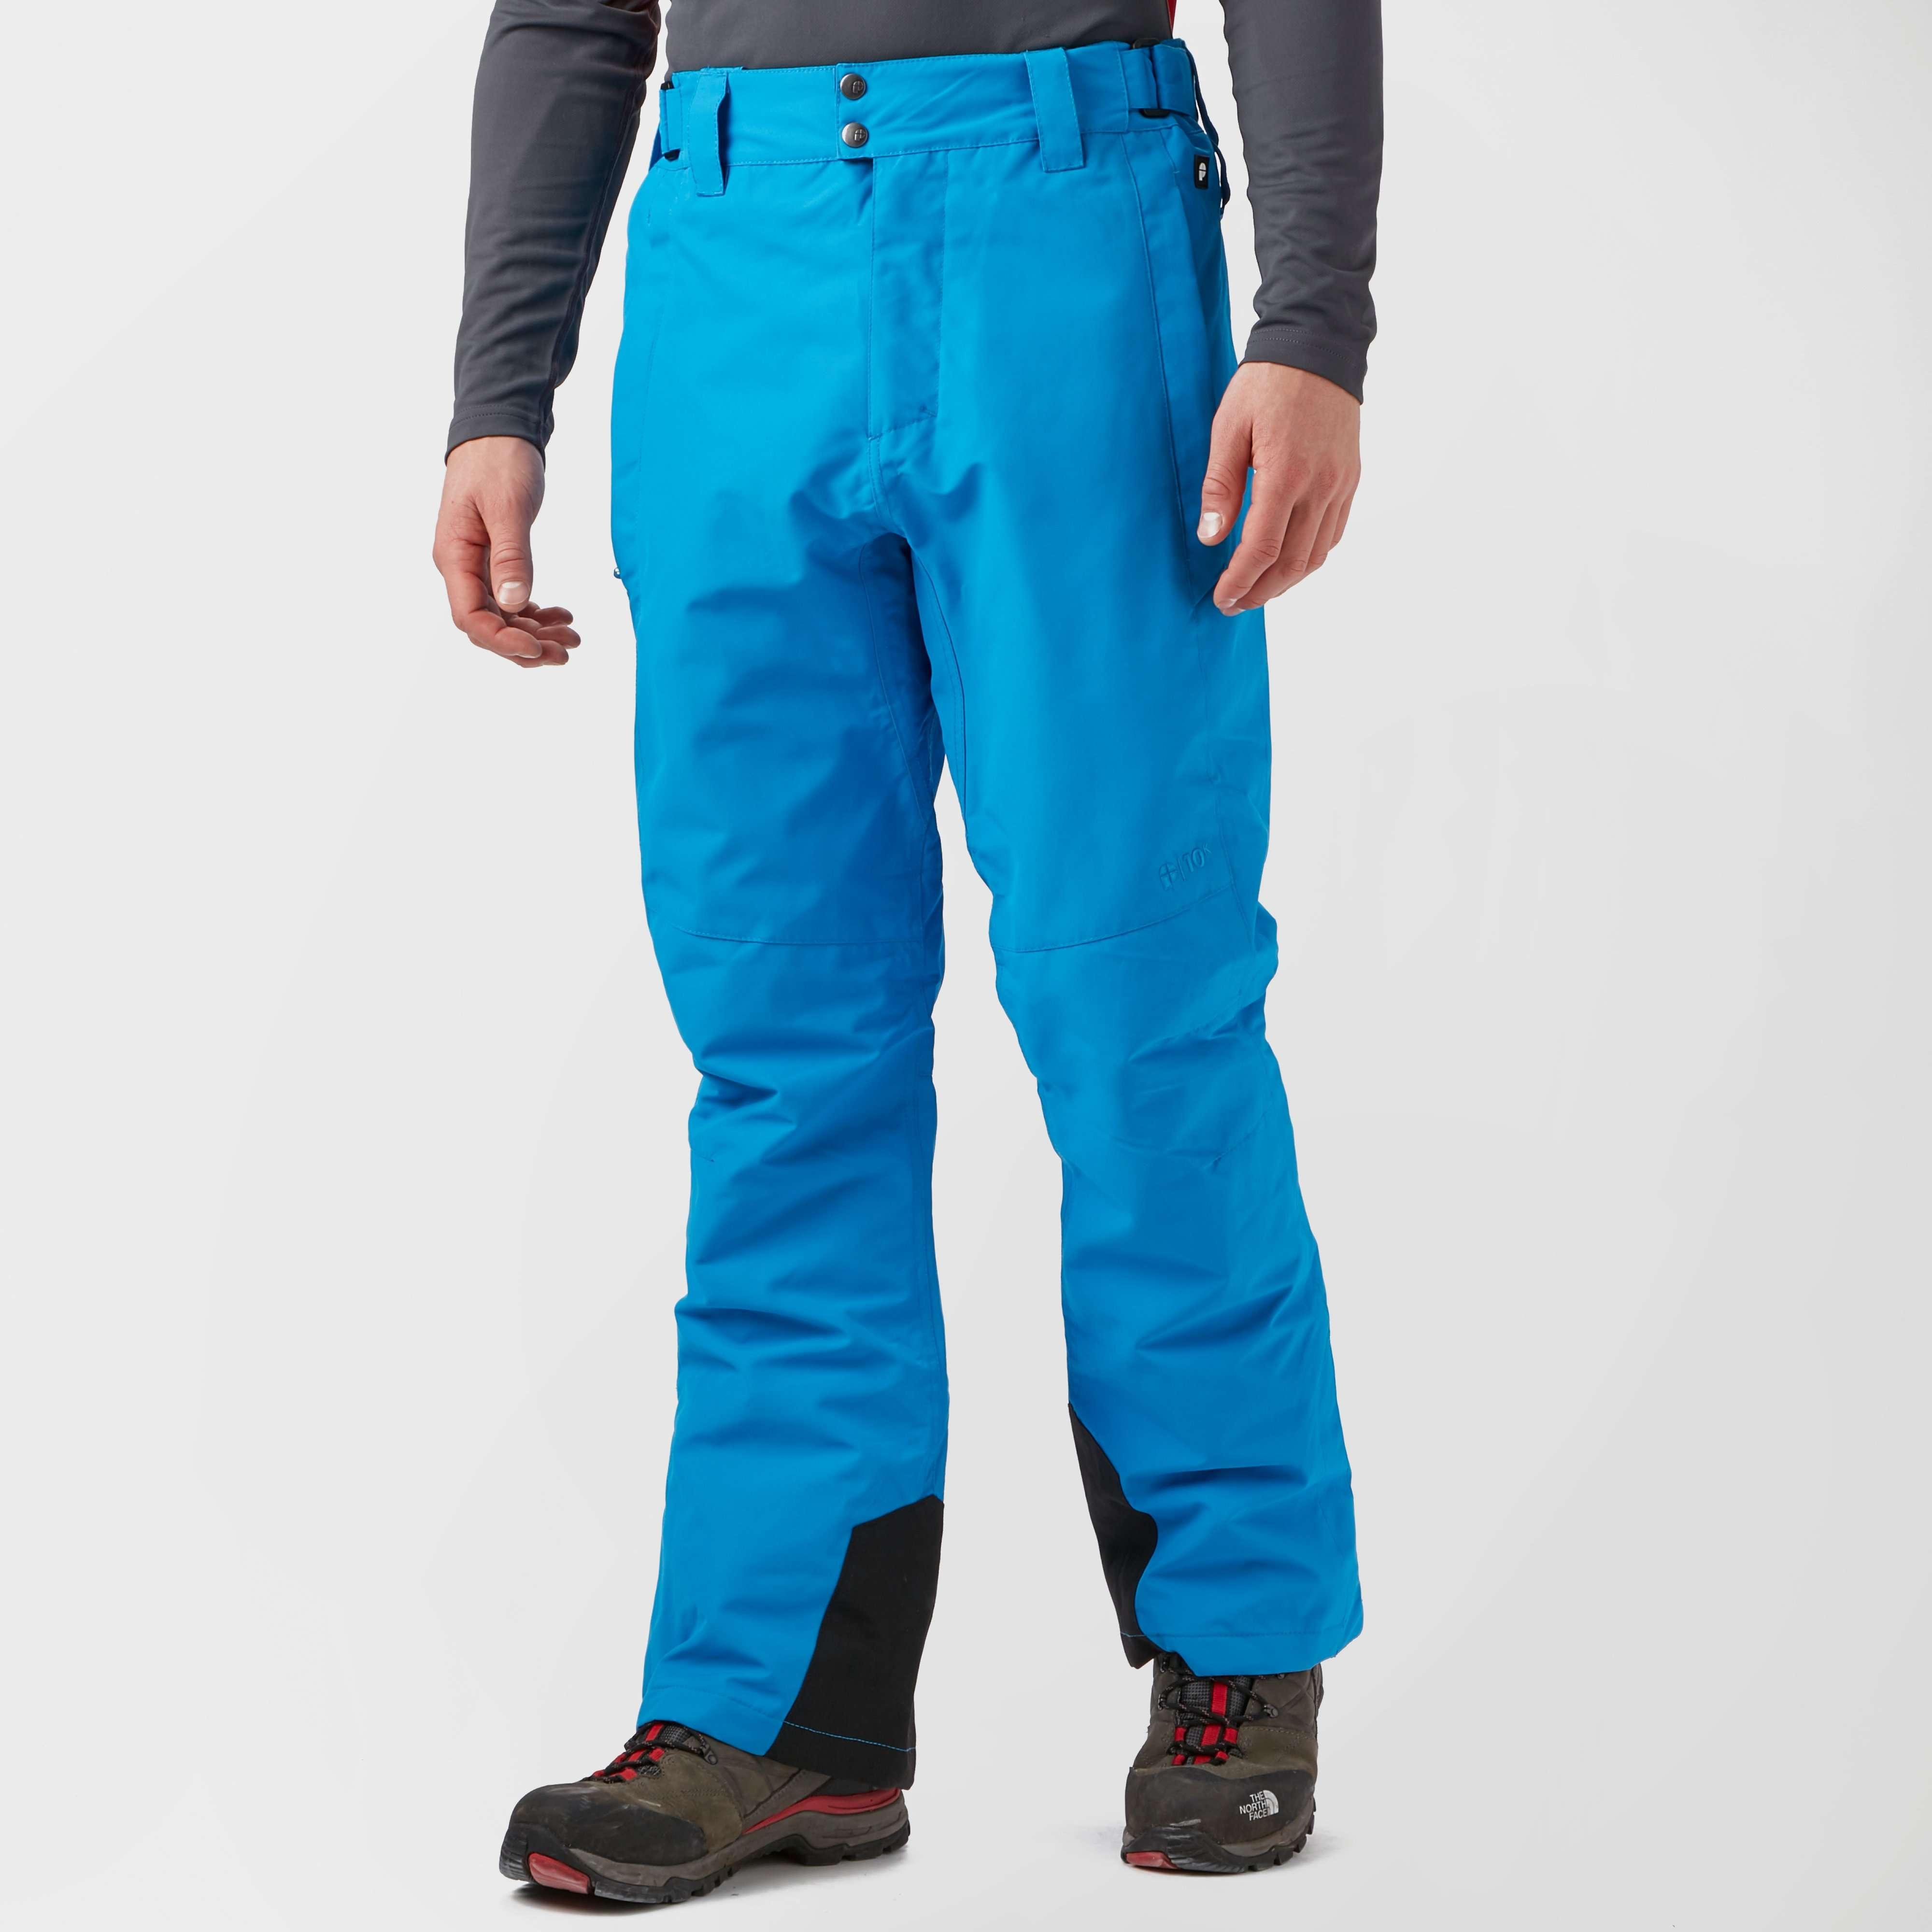 PROTEST Men's G Owenys Snow Ski Pant